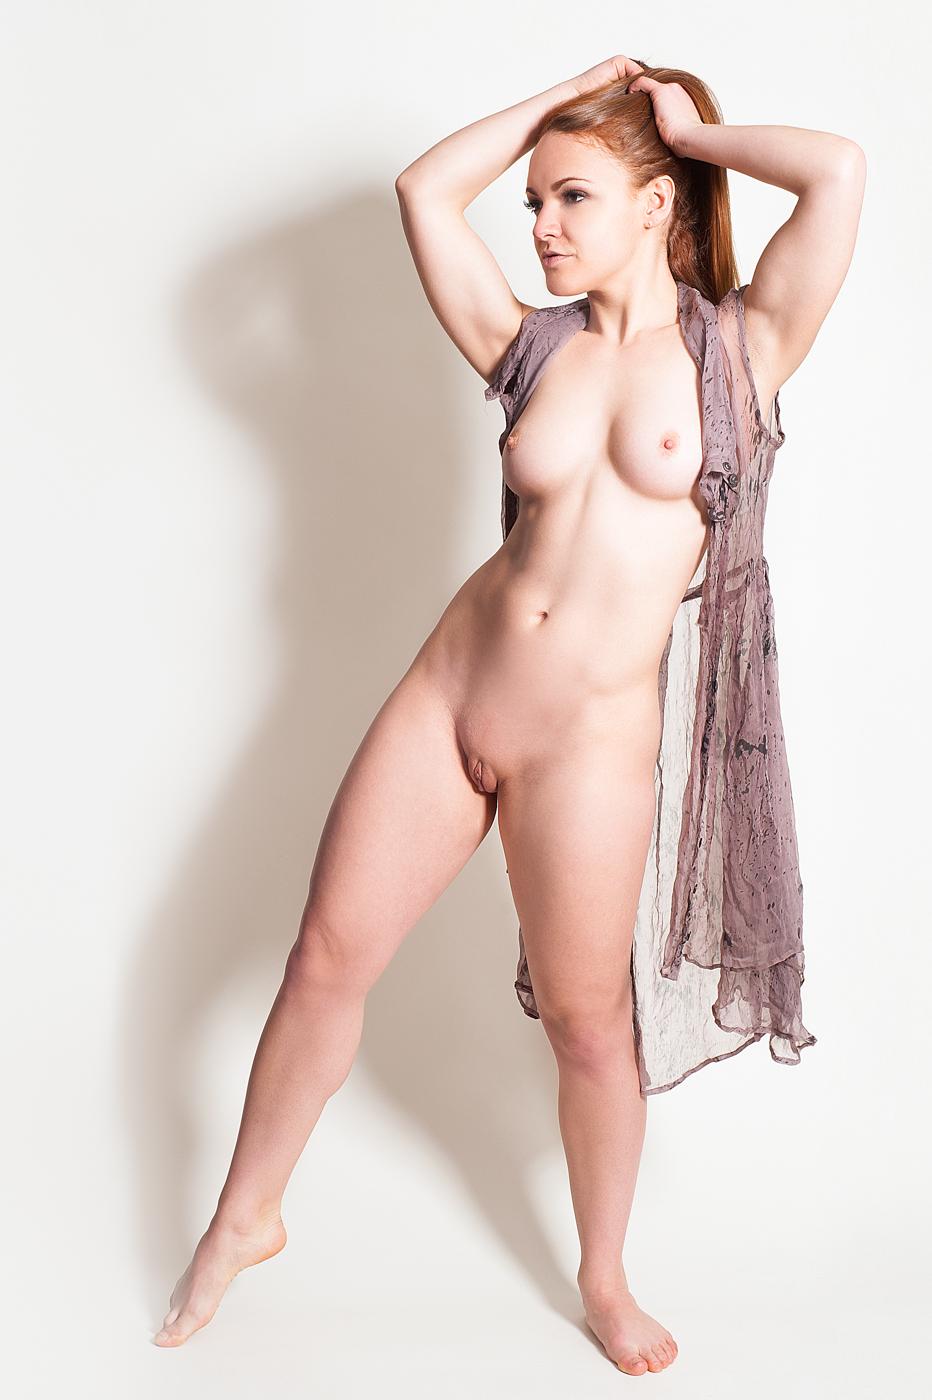 For Leah hilton nude